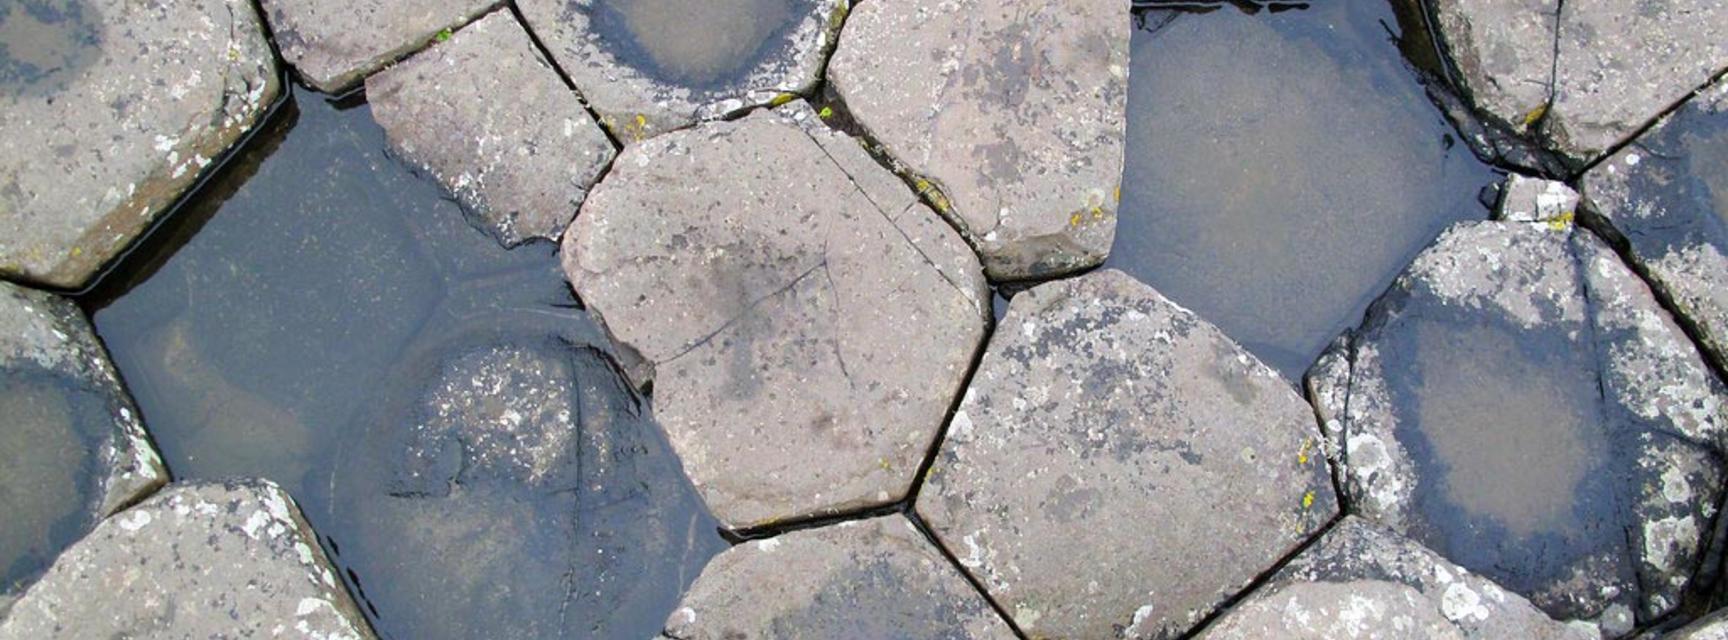 Basalt hexagons at the Giants Causeway